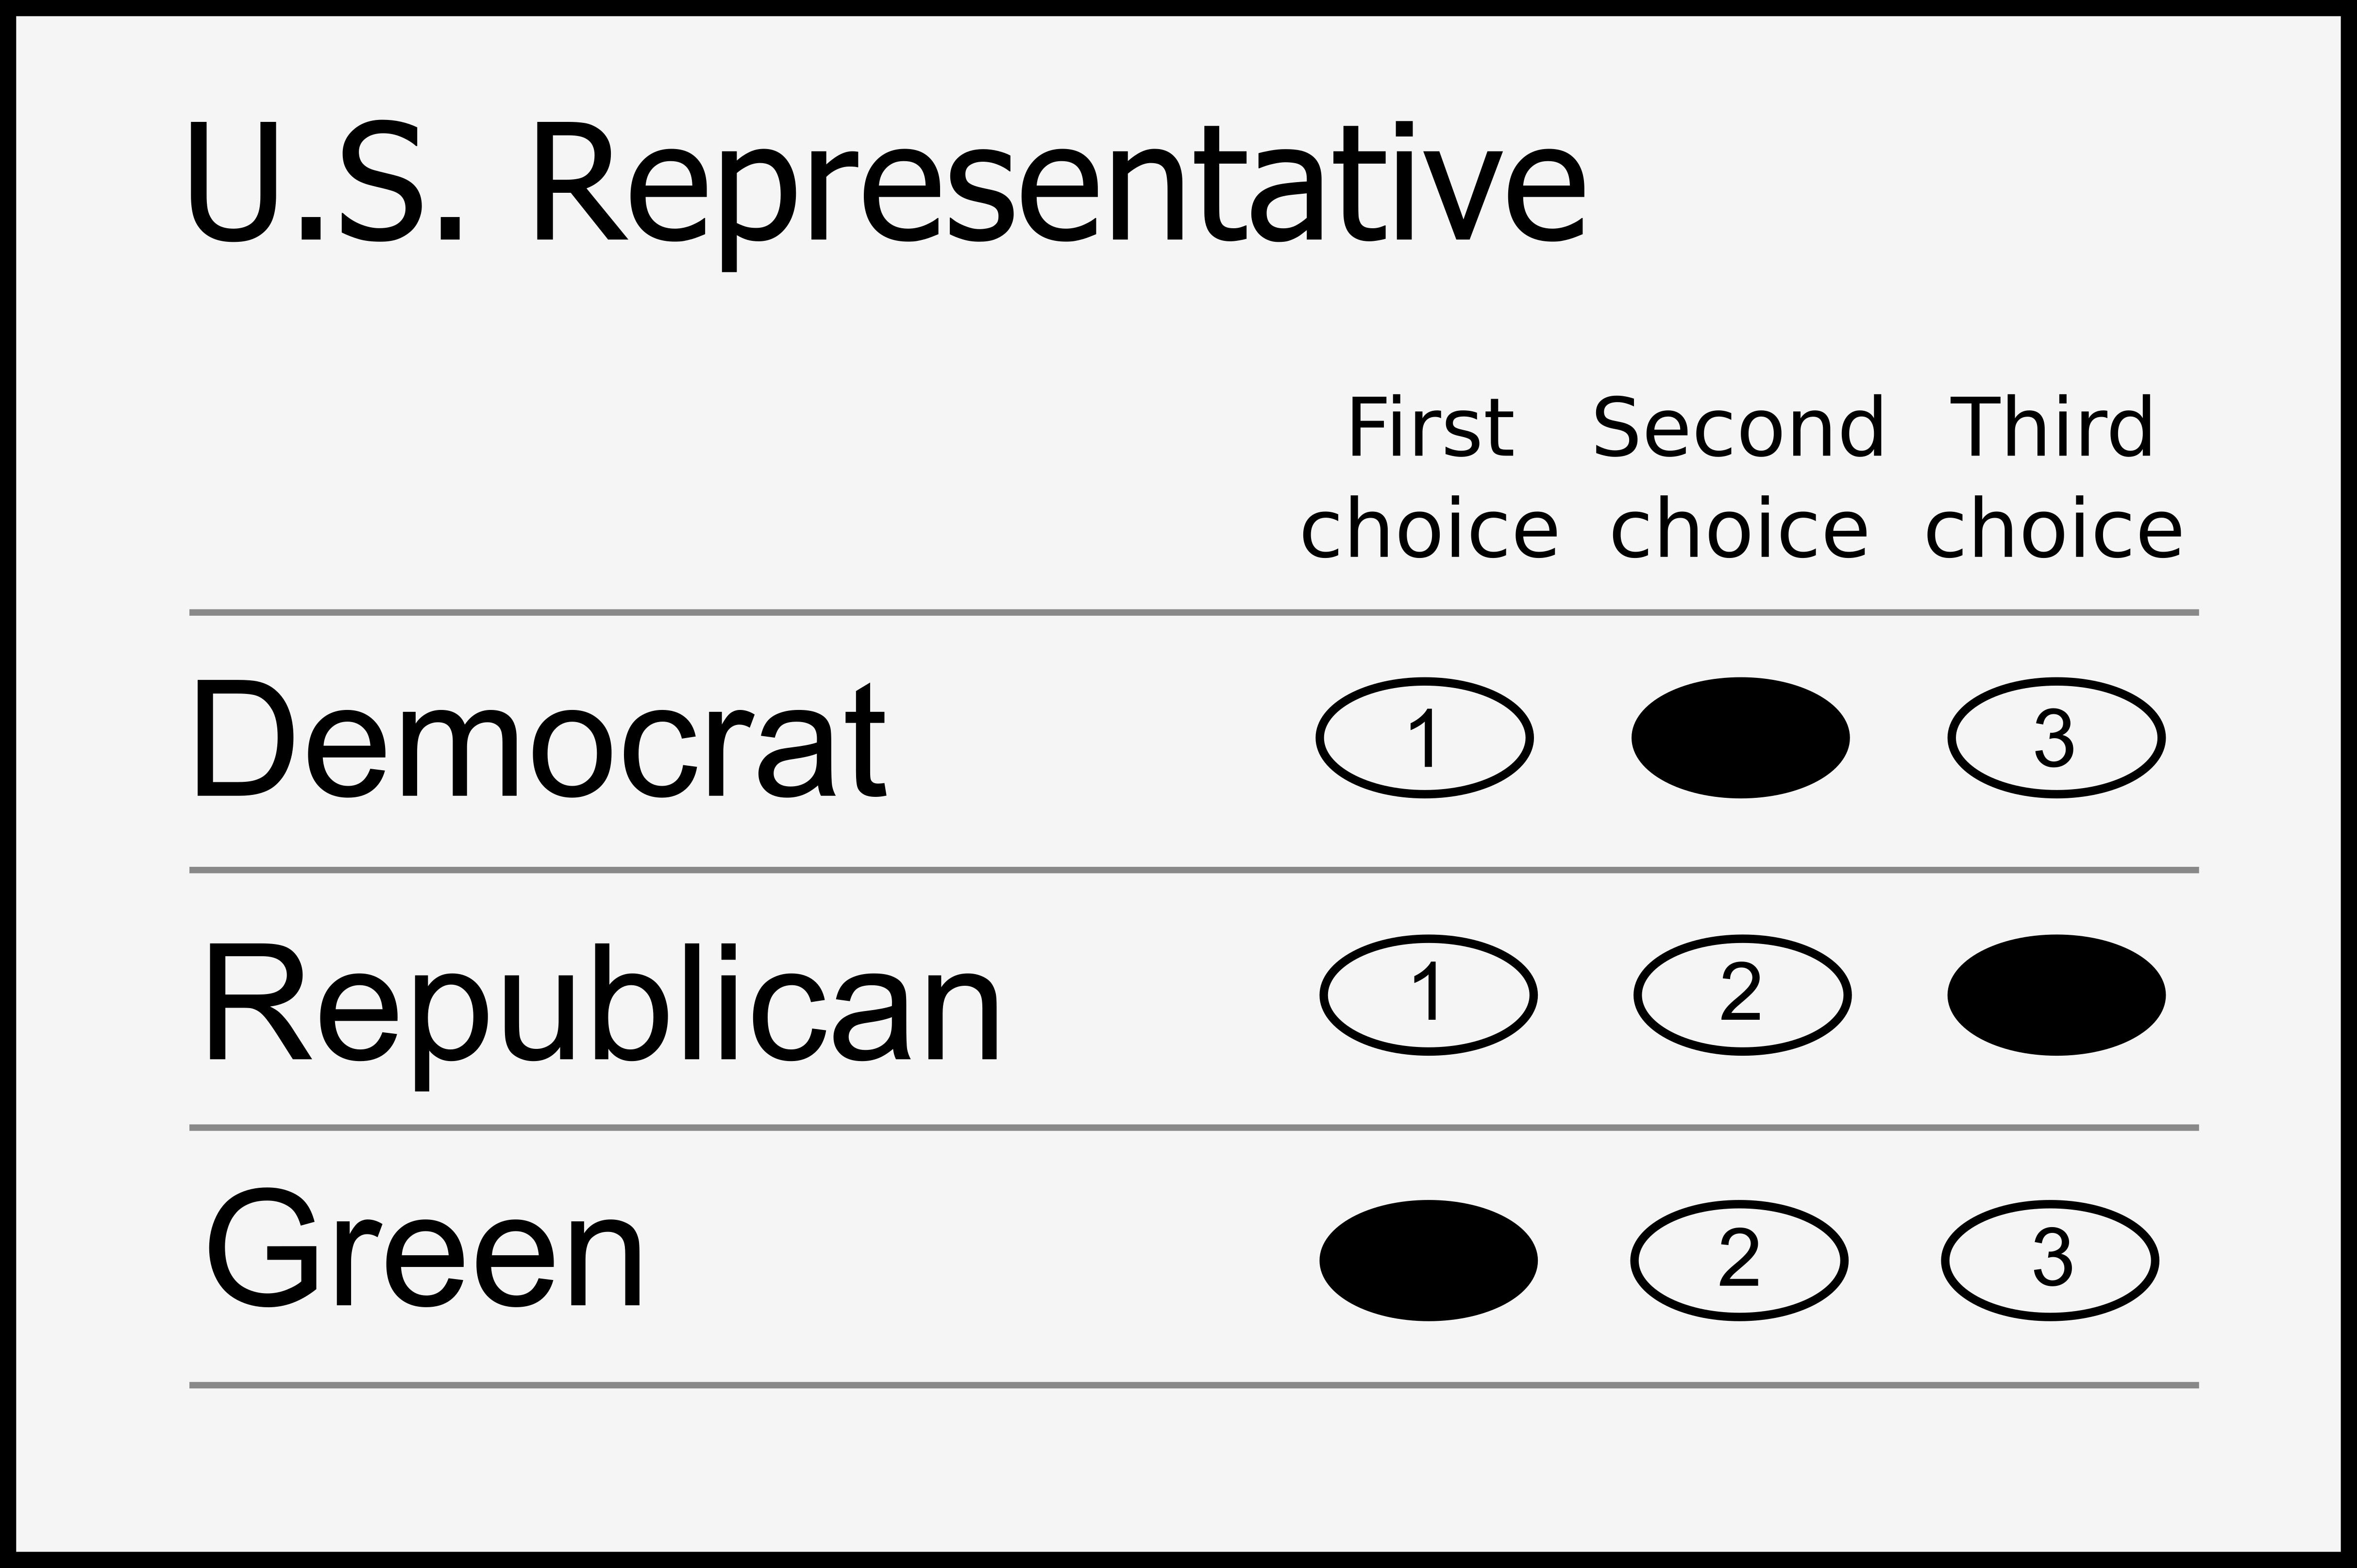 ranked ballot, green candidate first